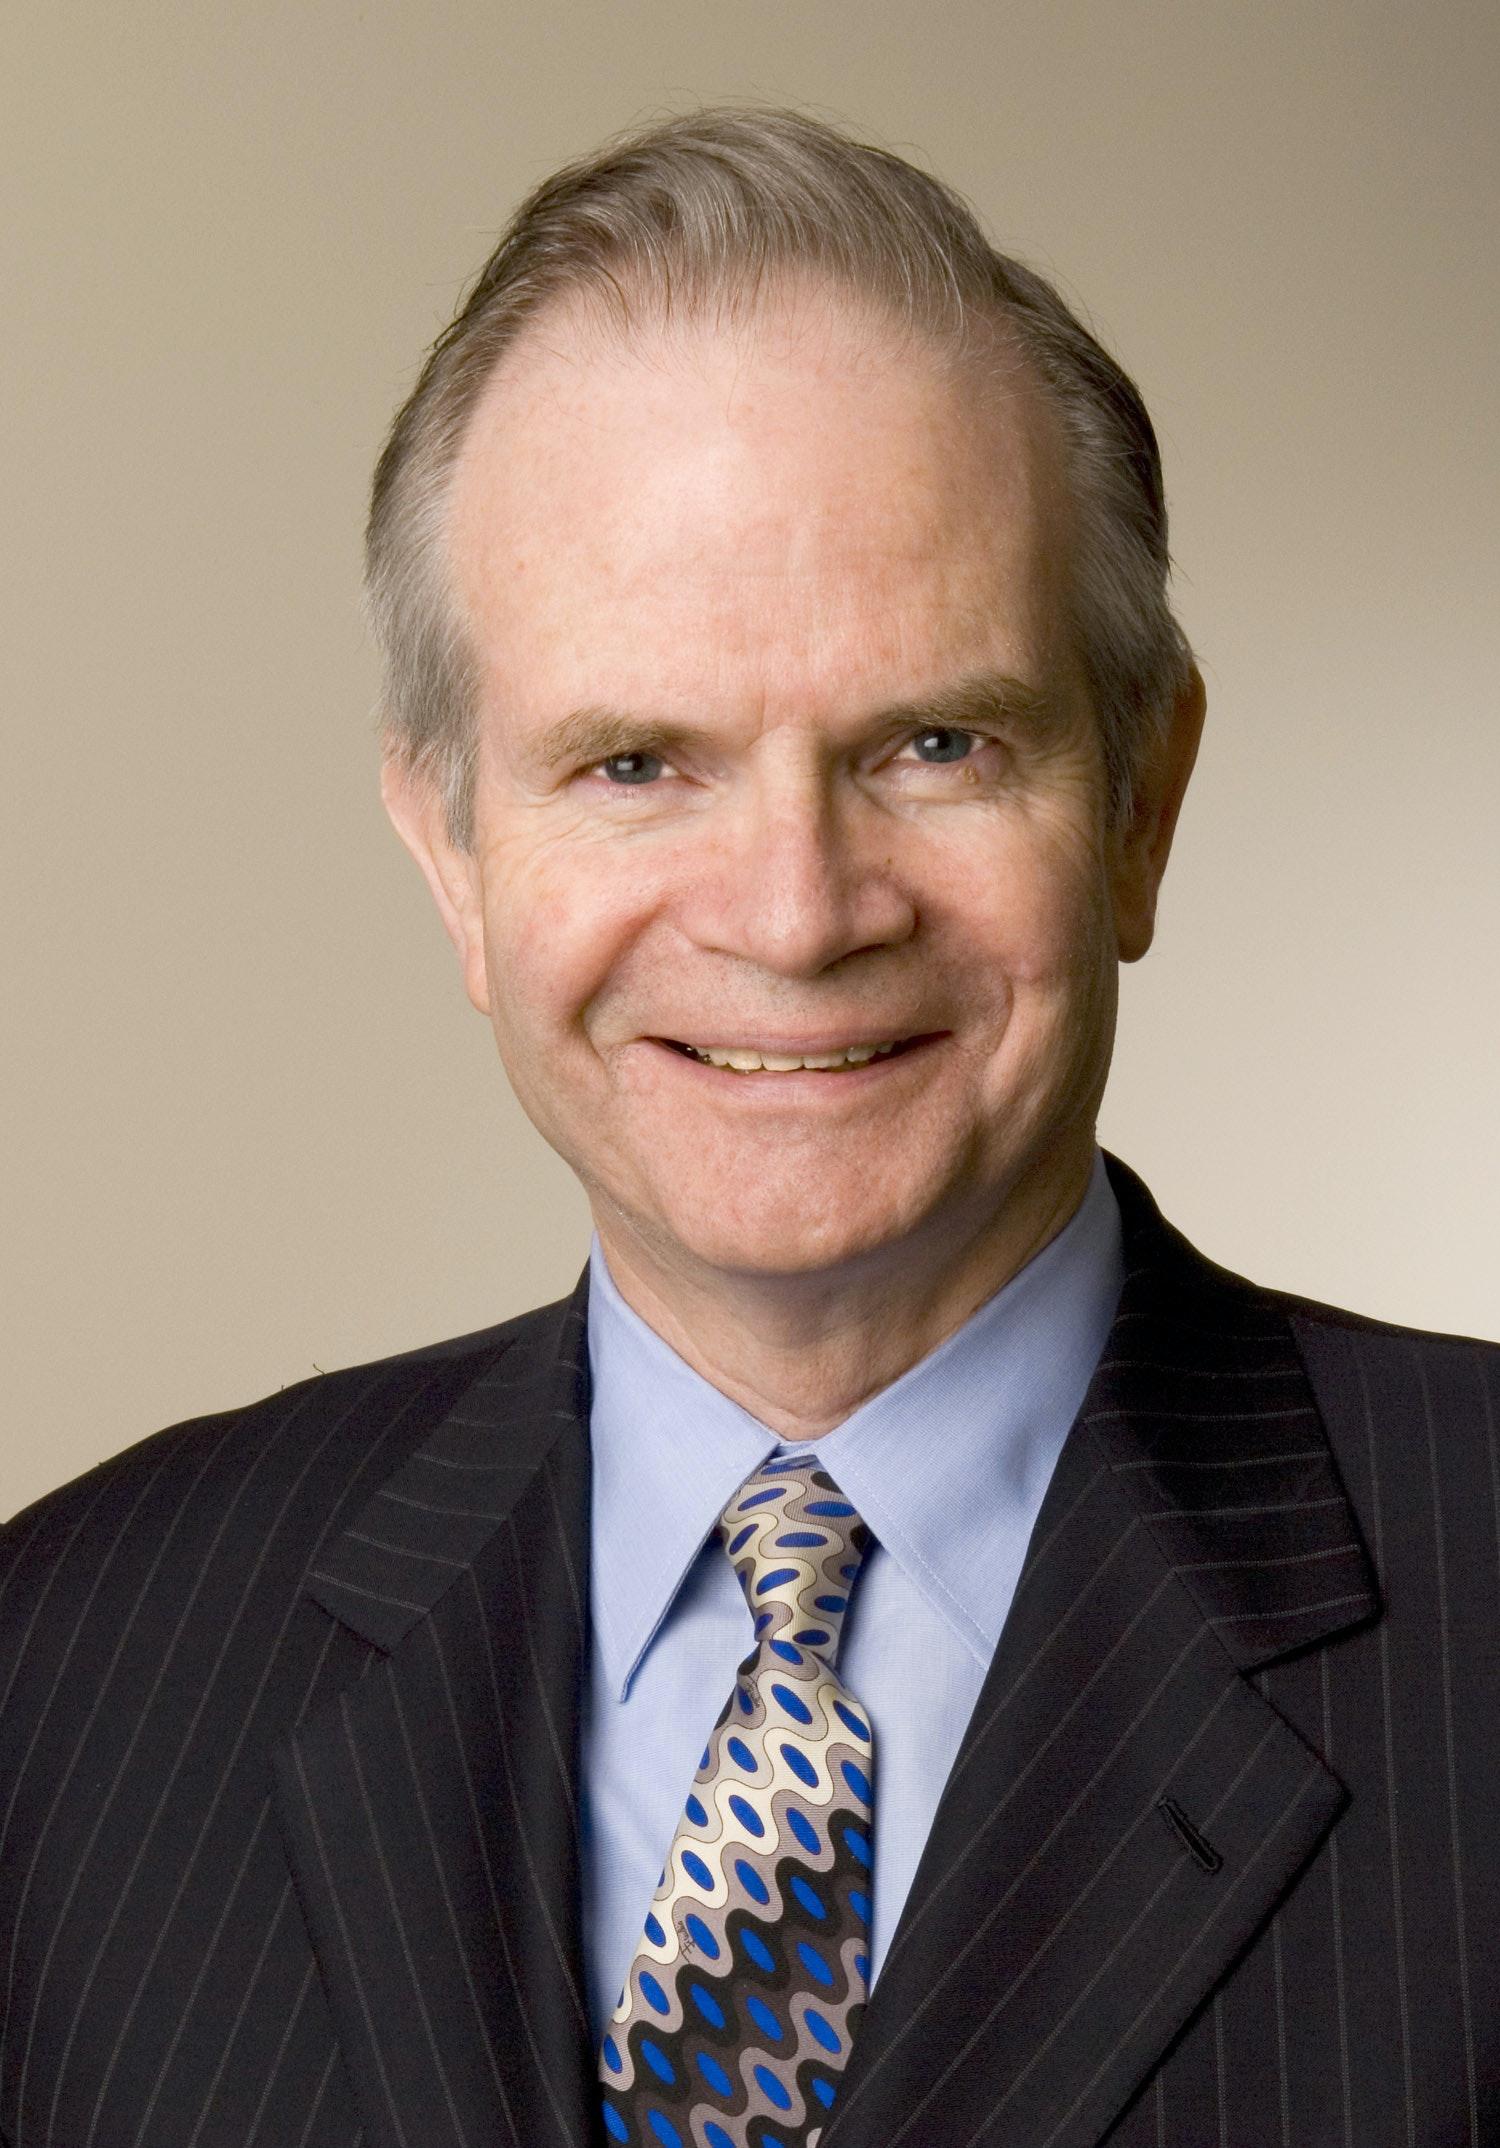 Photo of Paul E. Steiger